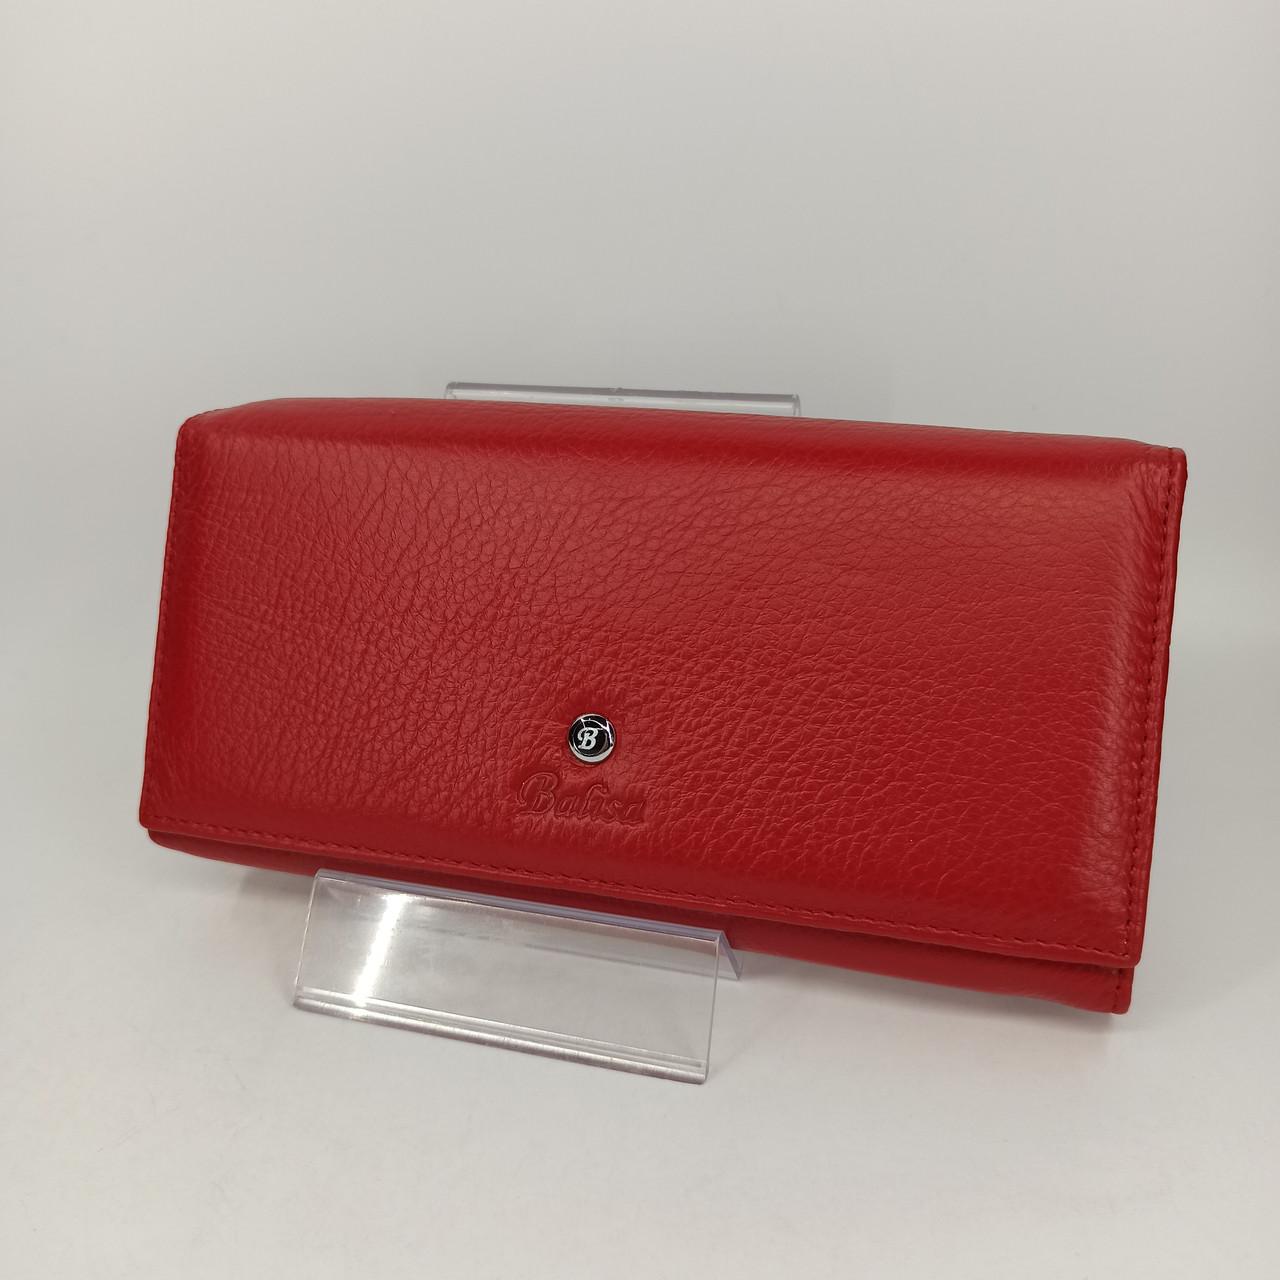 Класичний шкіряний жіночий гаманець / Классический кожаный женский кошелек Balisa B106-580-2 red